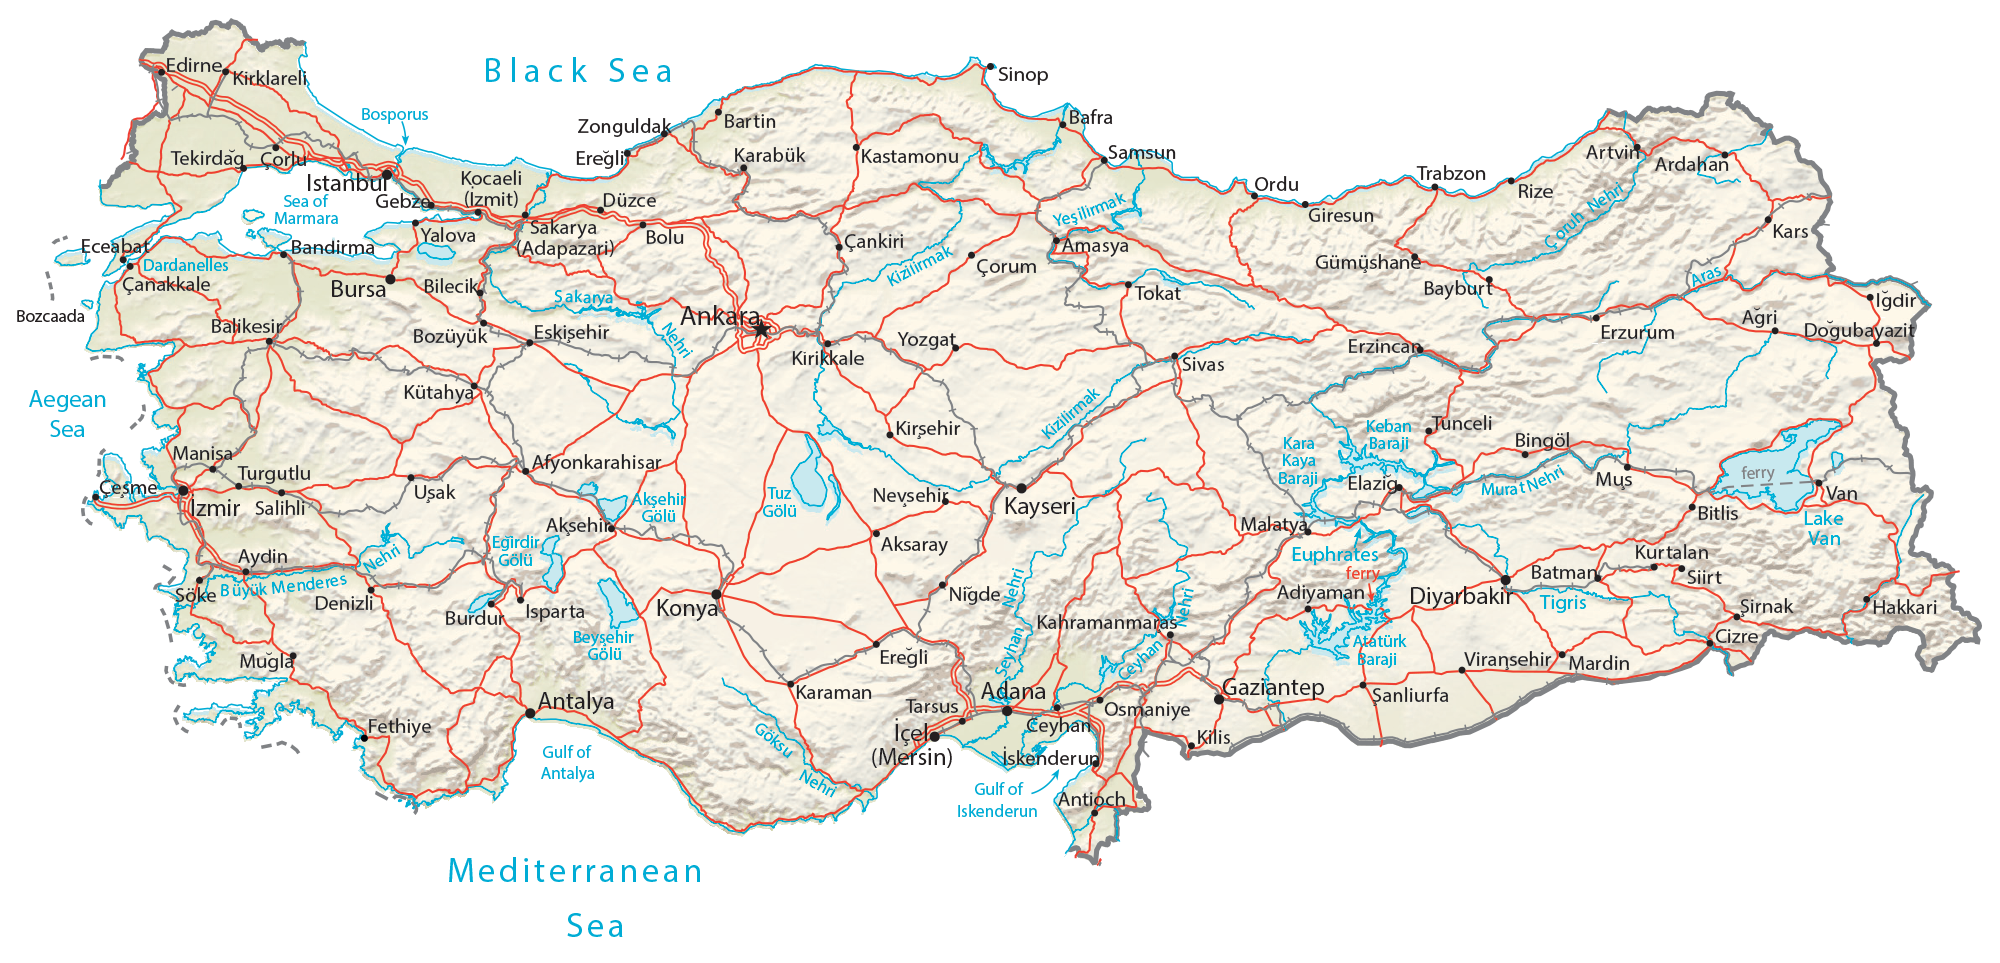 Turkey Physical Map